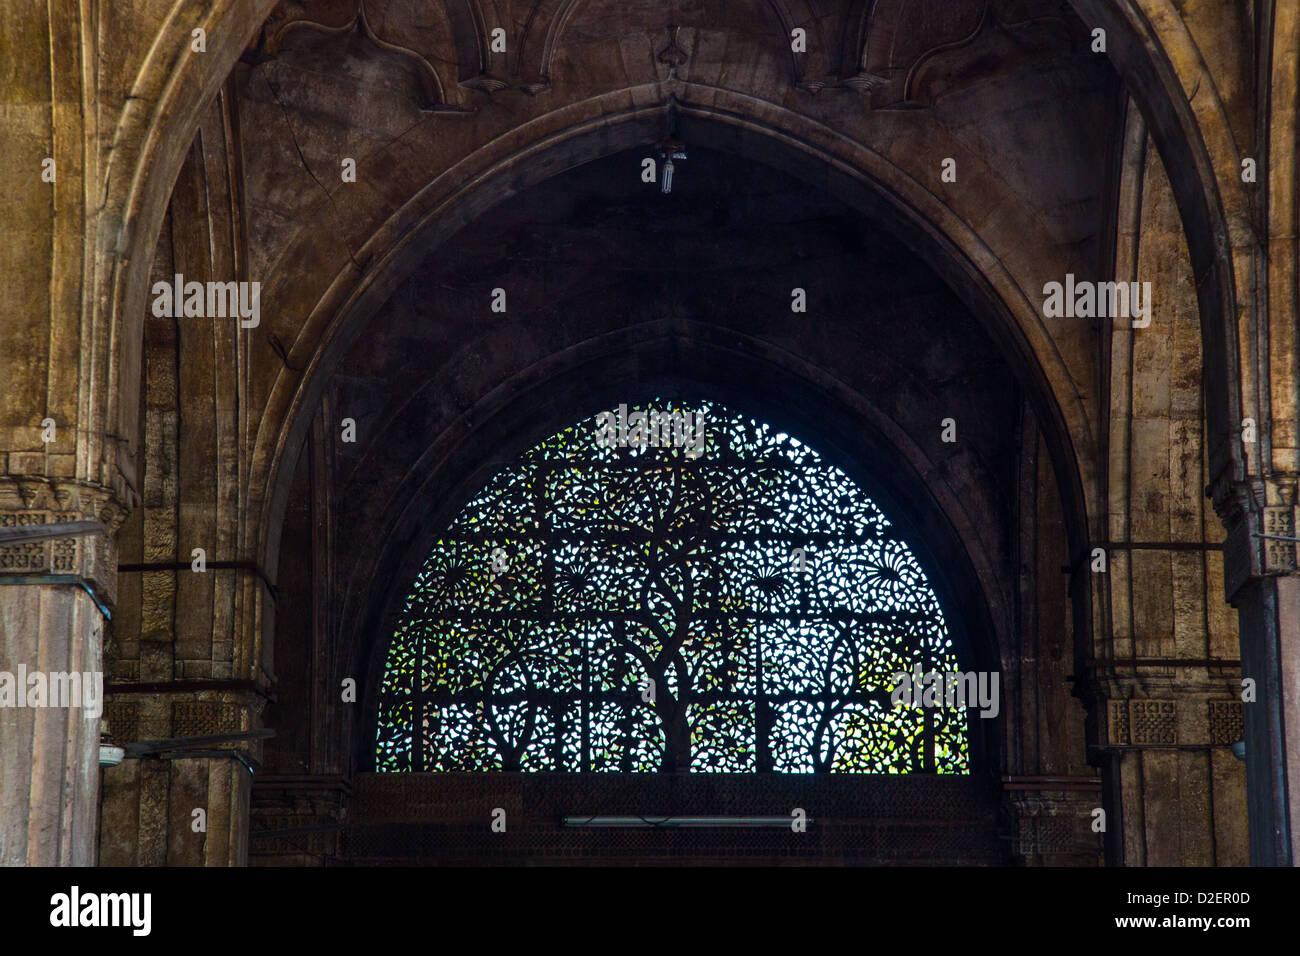 Ornate carved Jali at Sidi Sayyid Mosque, Ahmedabad, Gujarat, India - Stock Image